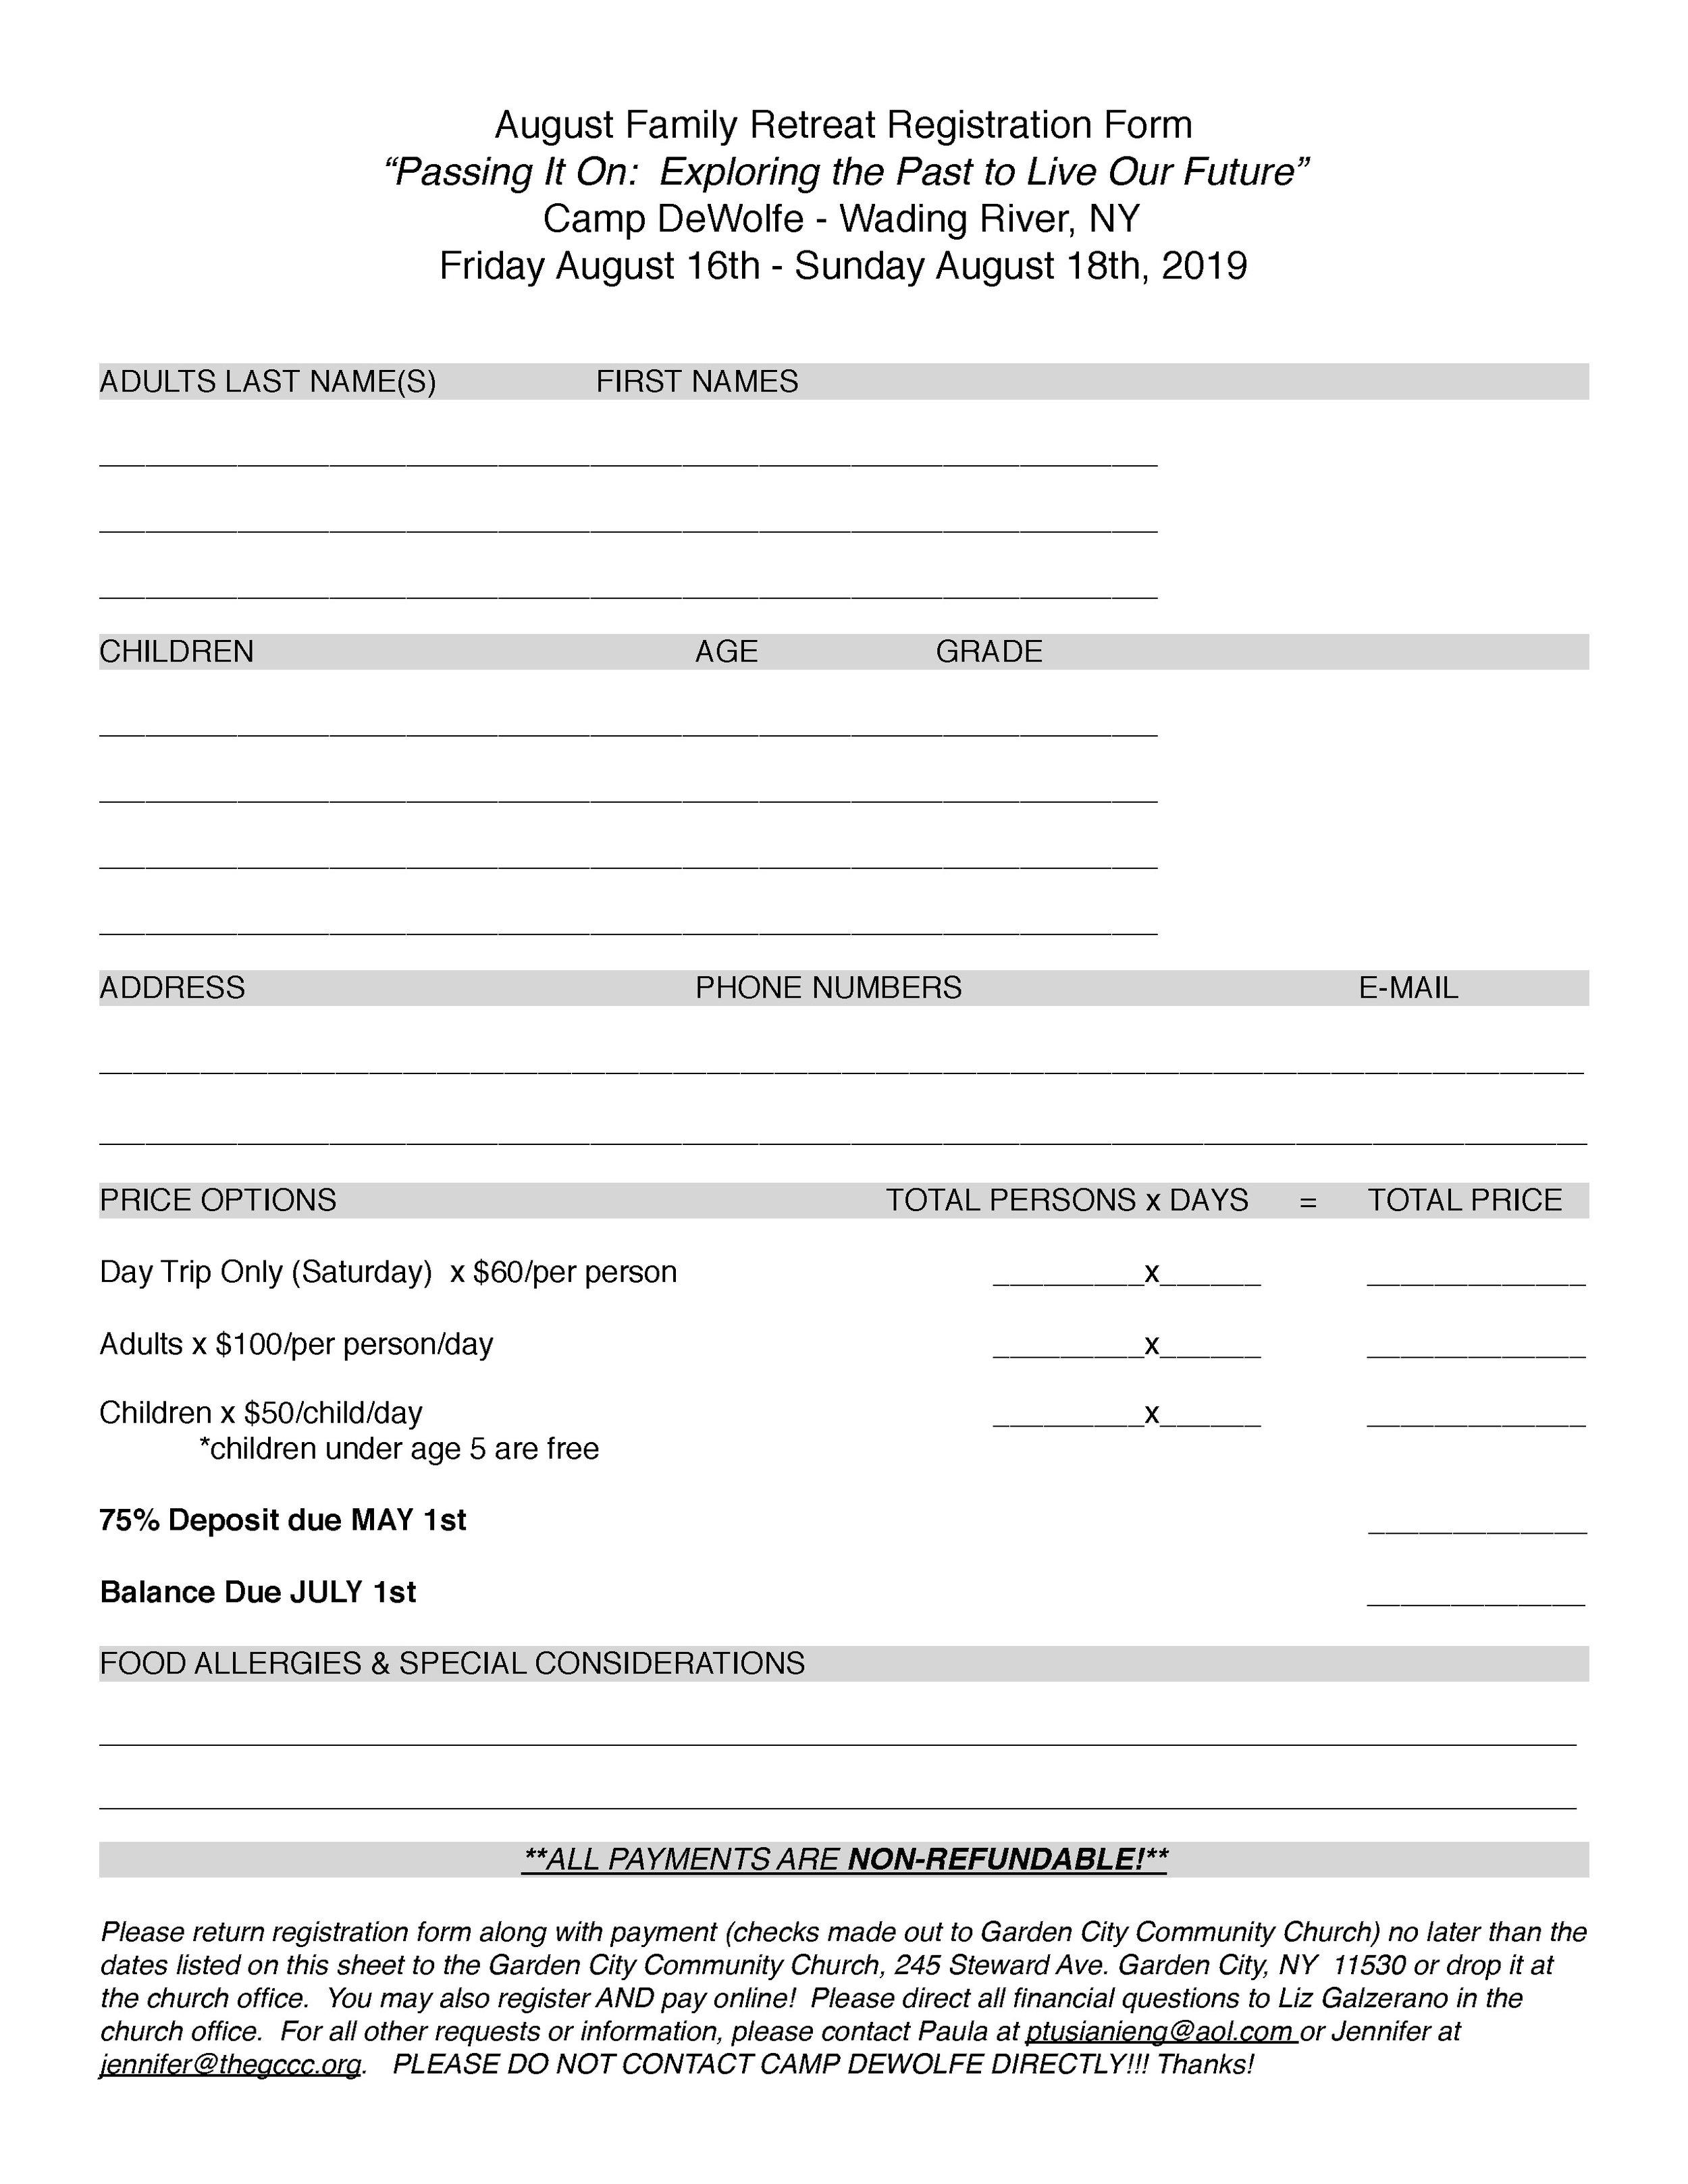 08-16-19 - Family Retreat Registration  2019.jpg